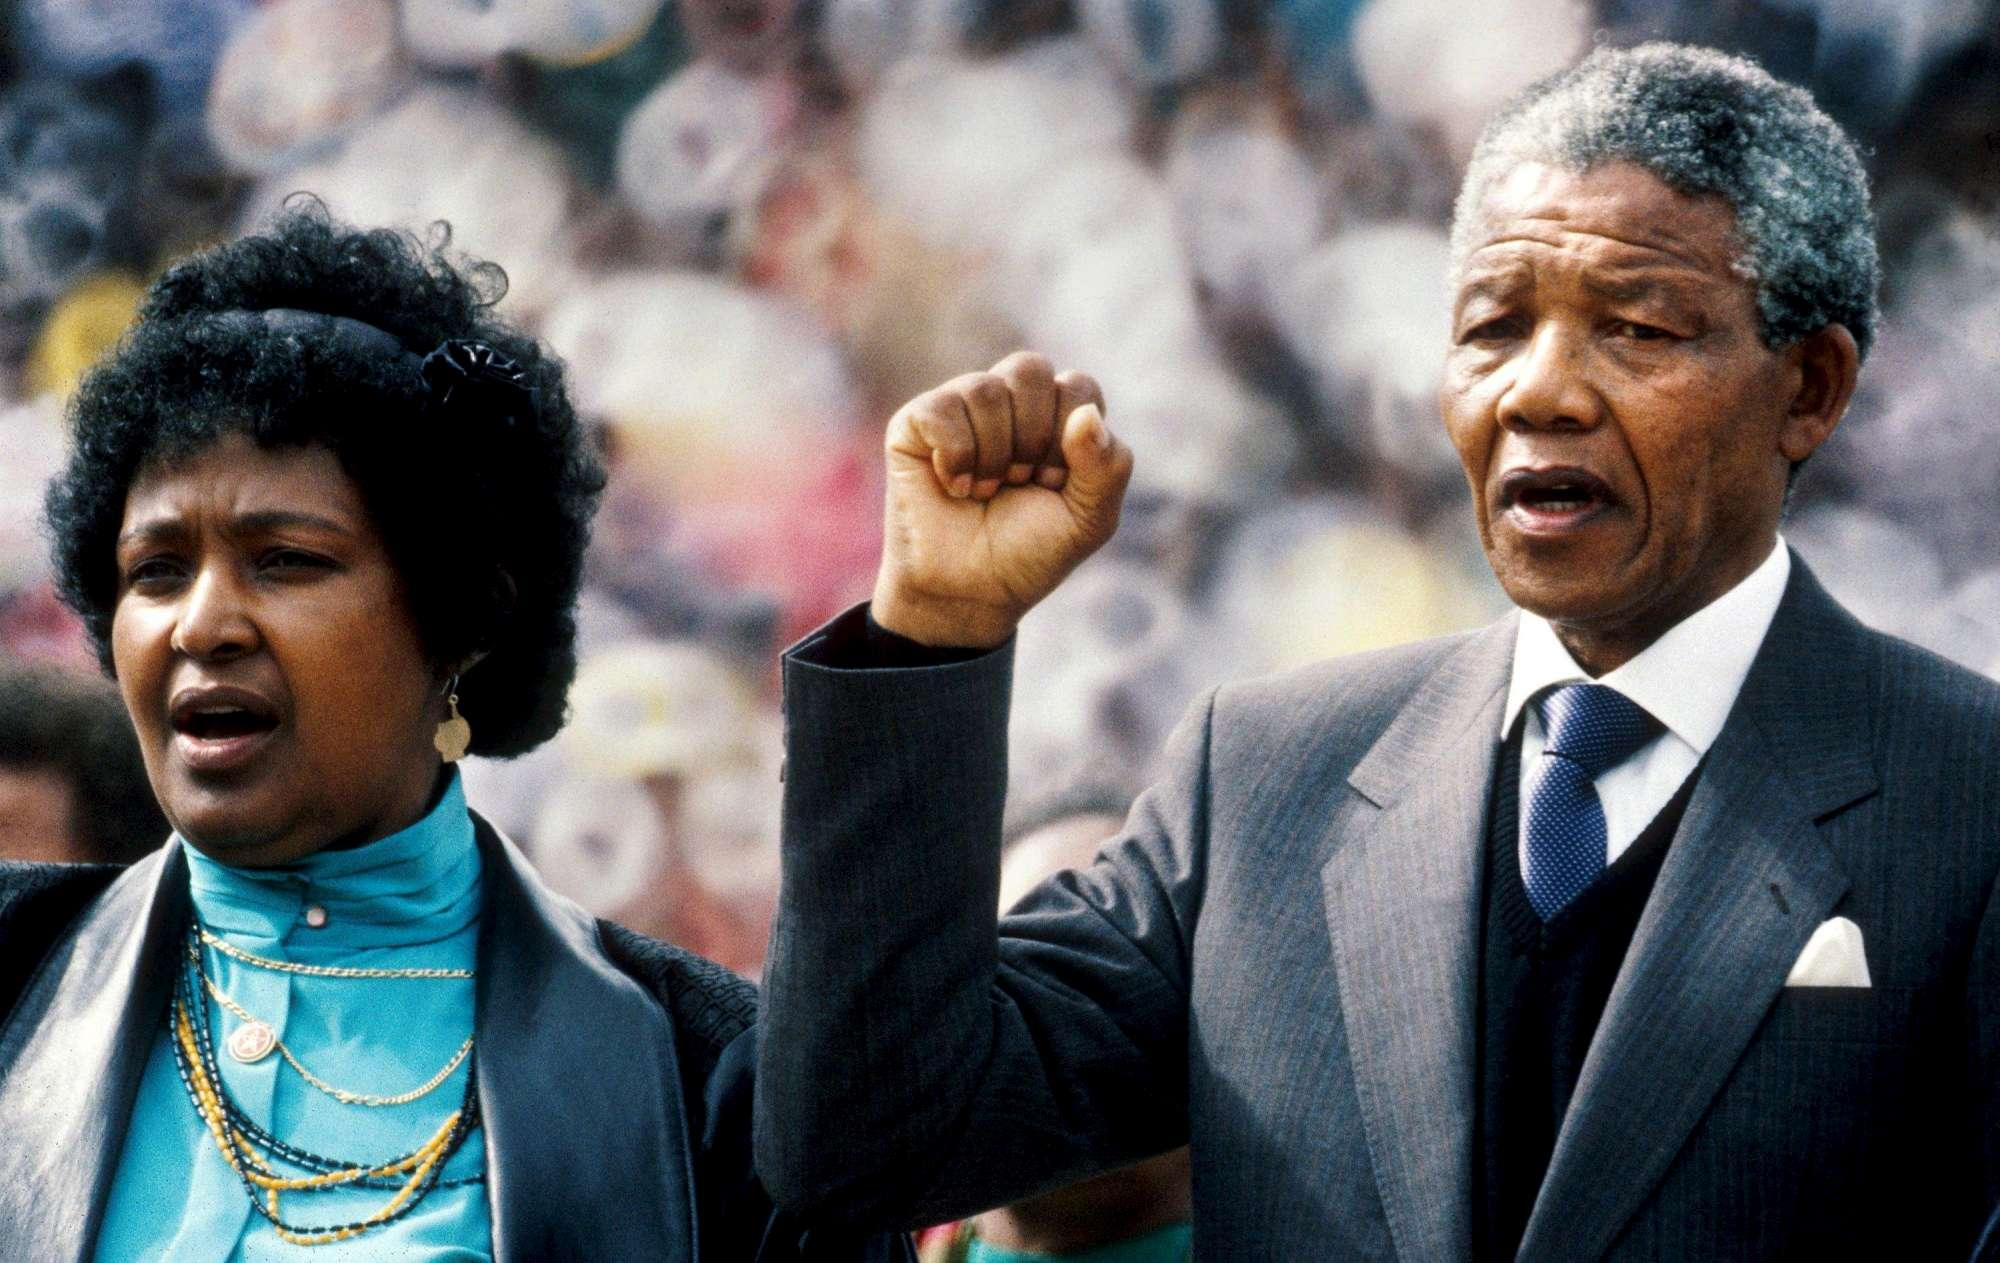 Morta Winnie Mandela, ex moglie di Nelson e